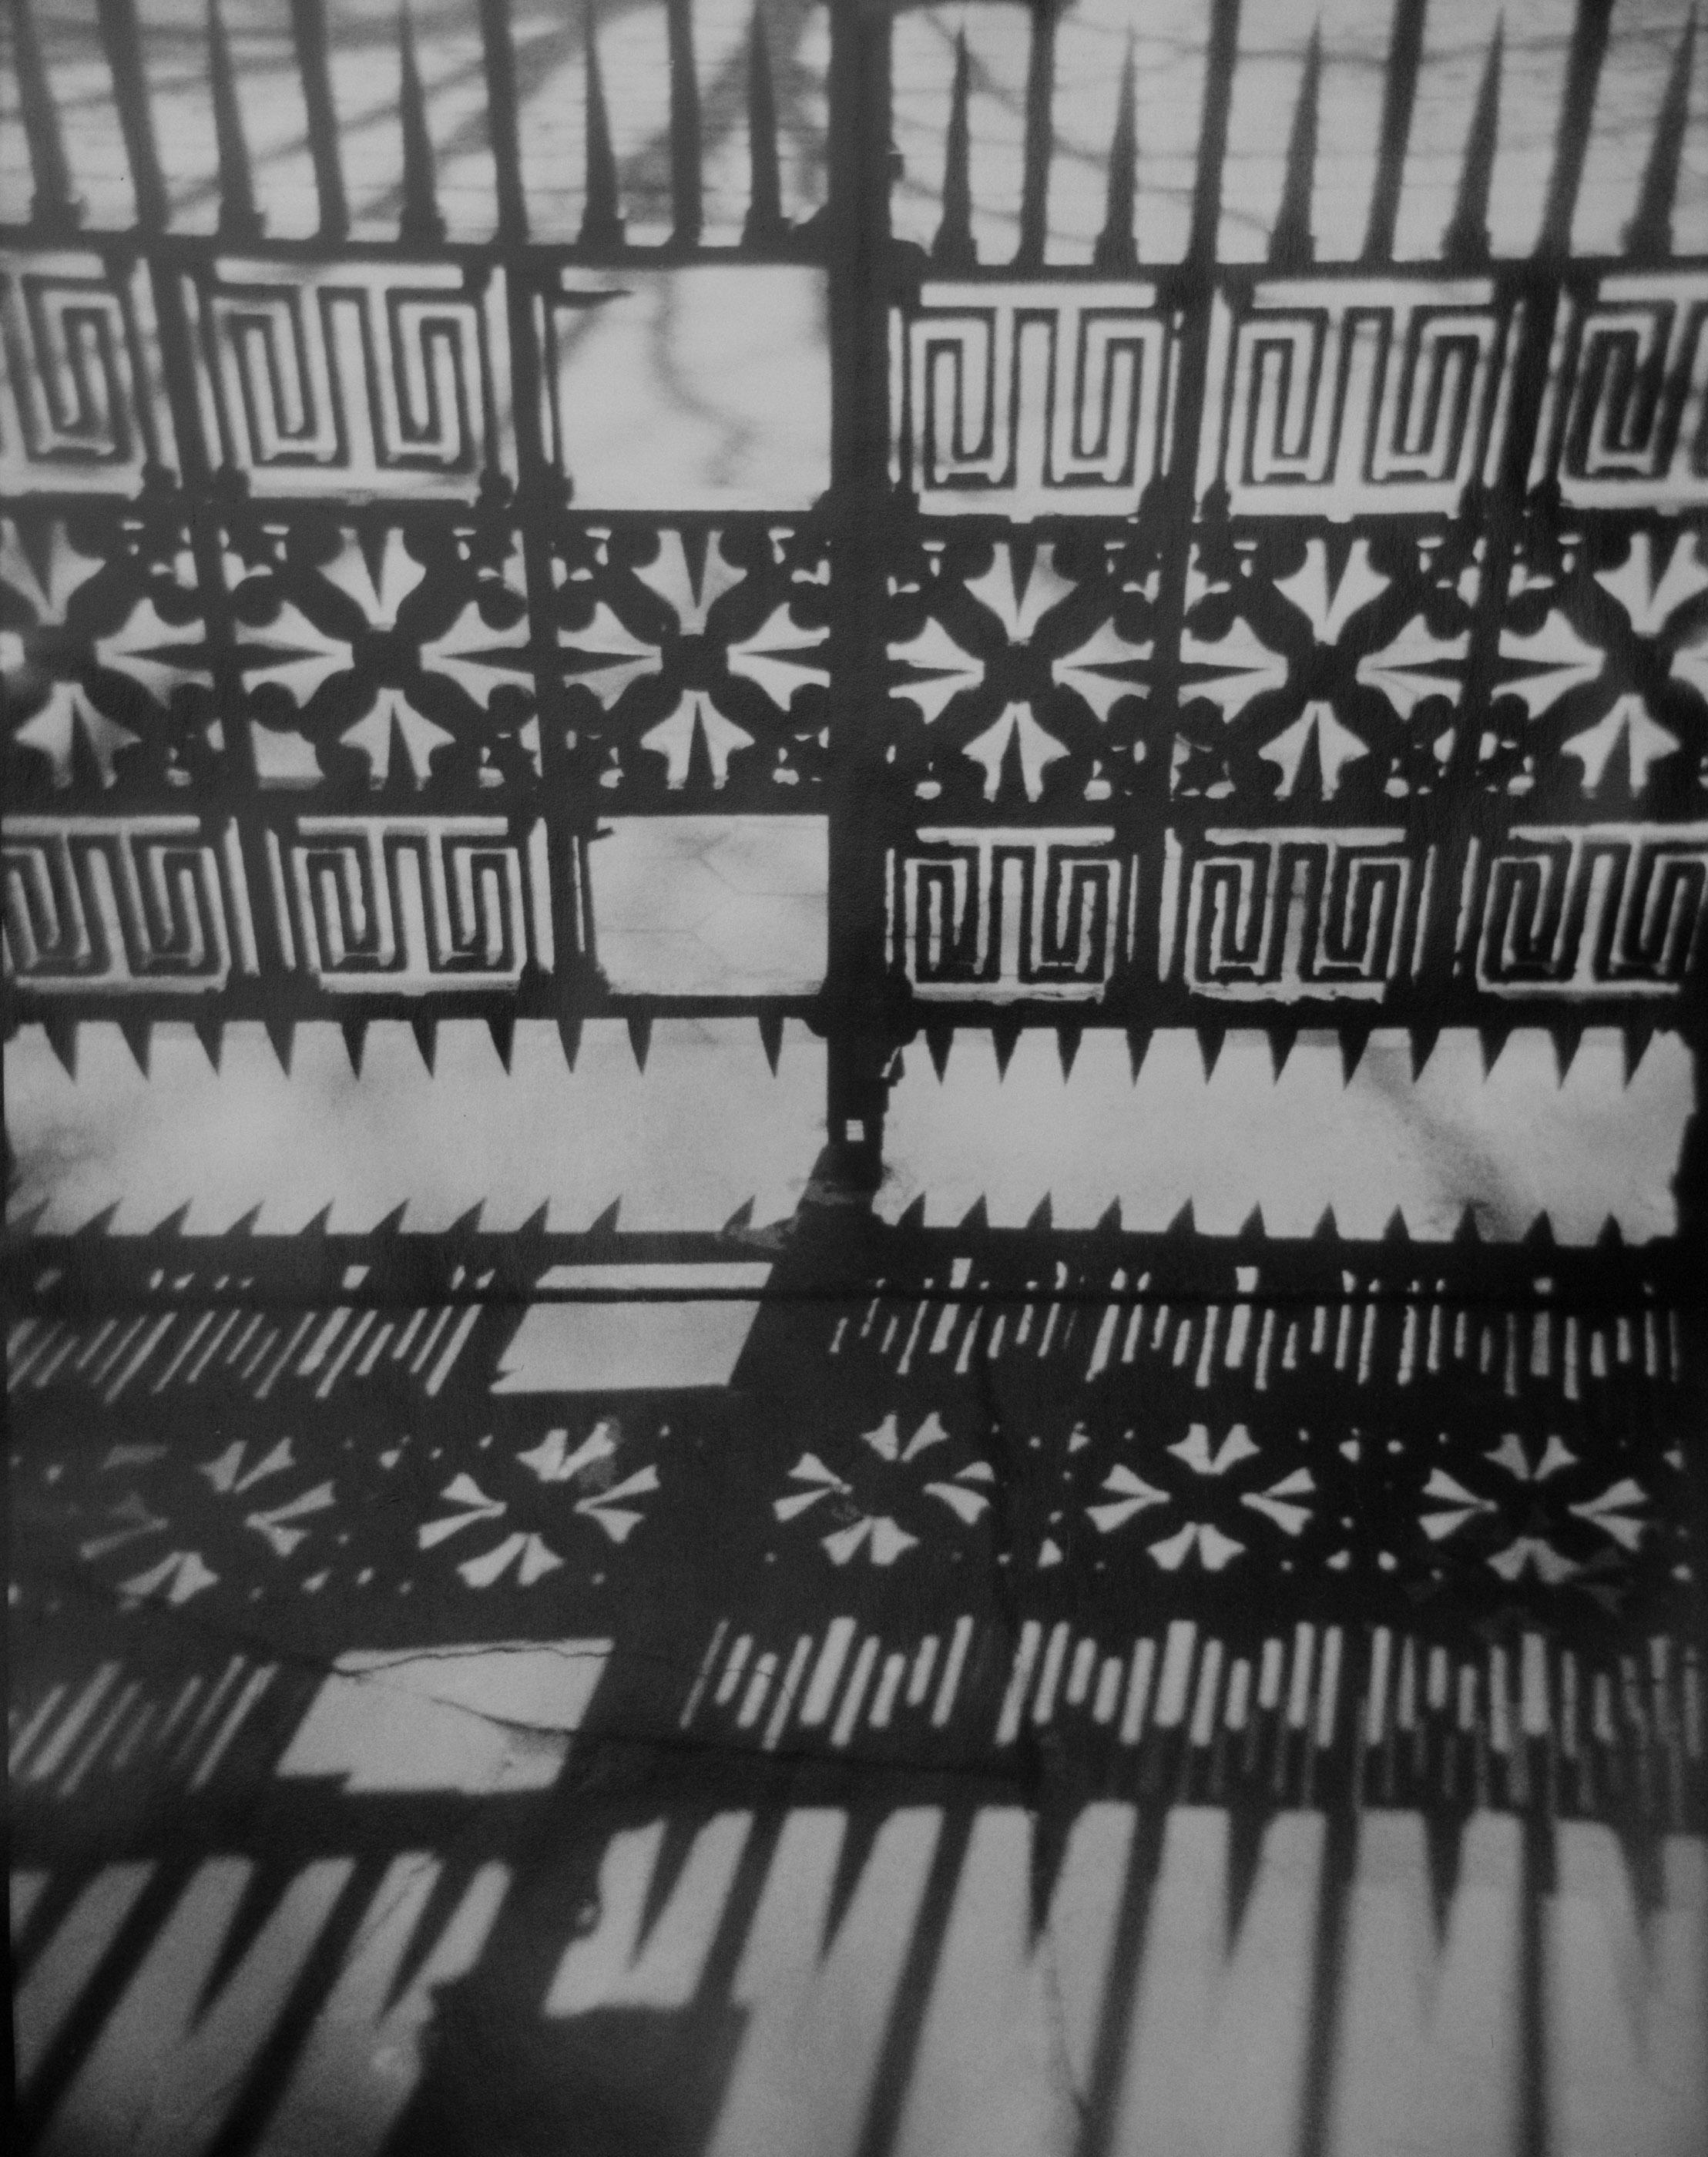 2_Grave Ground_St. Mark's Church-in-the-Bowerie, 1999-2000_.jpg